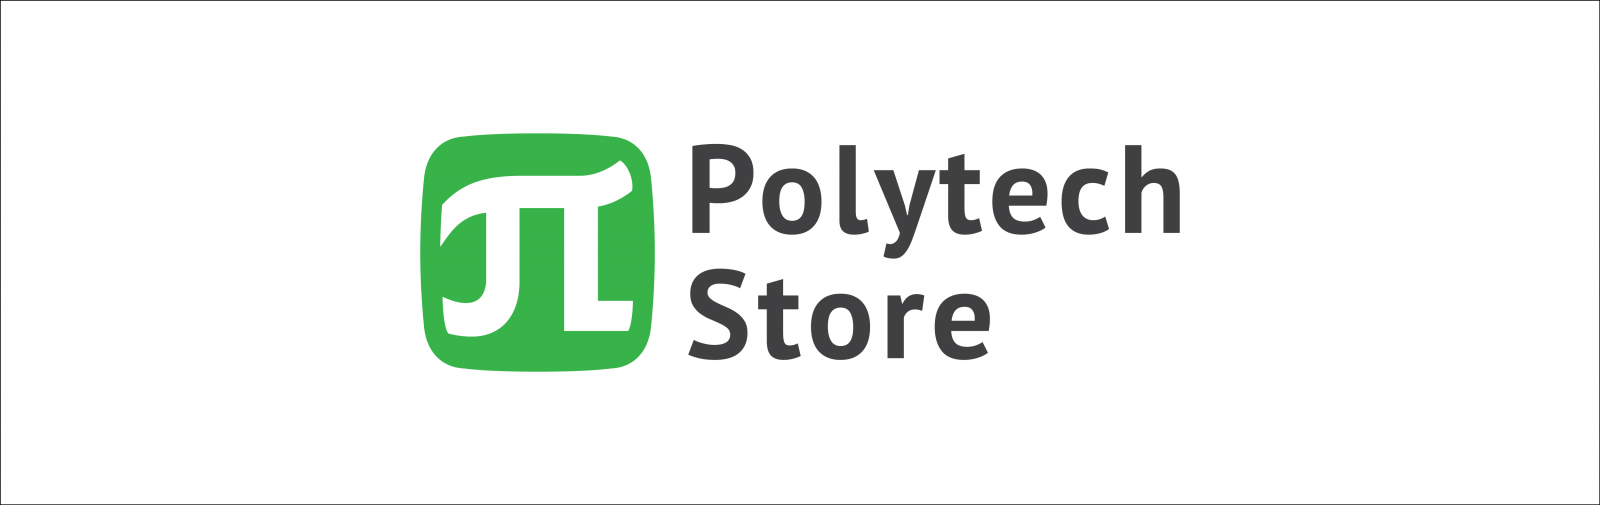 Polytech Store